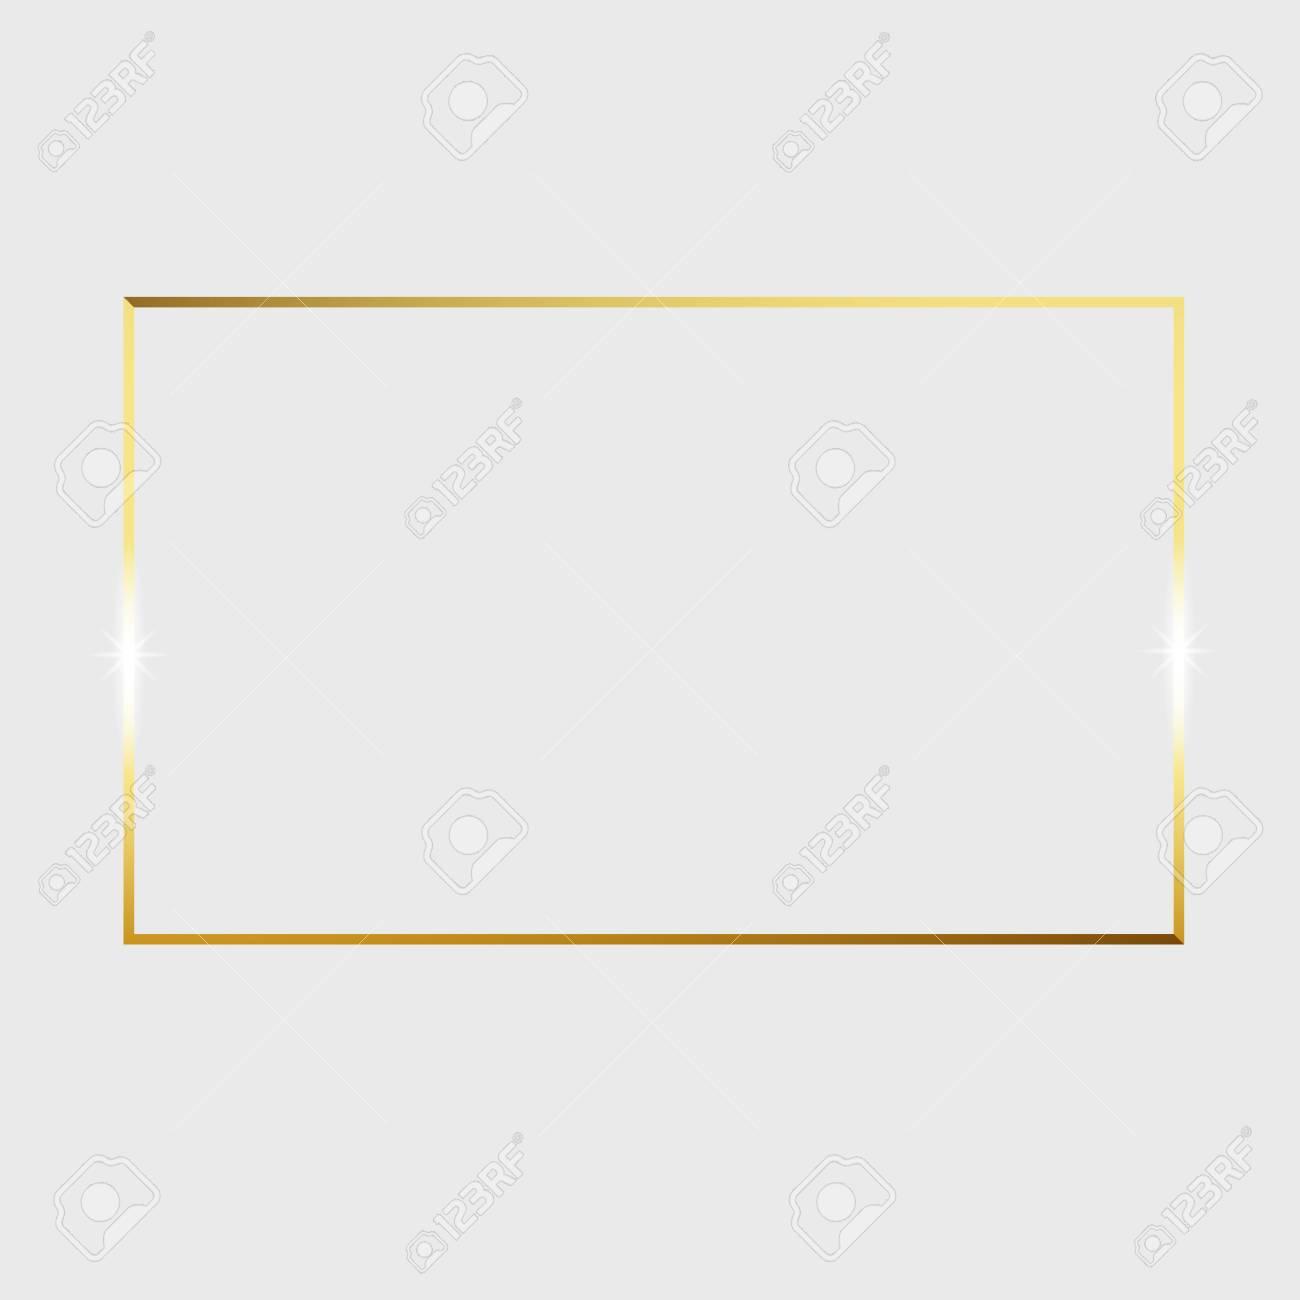 Gold shiny glowing vintage frame isolated on transparent background. Vector border illustration engraved ink art. - 118465270